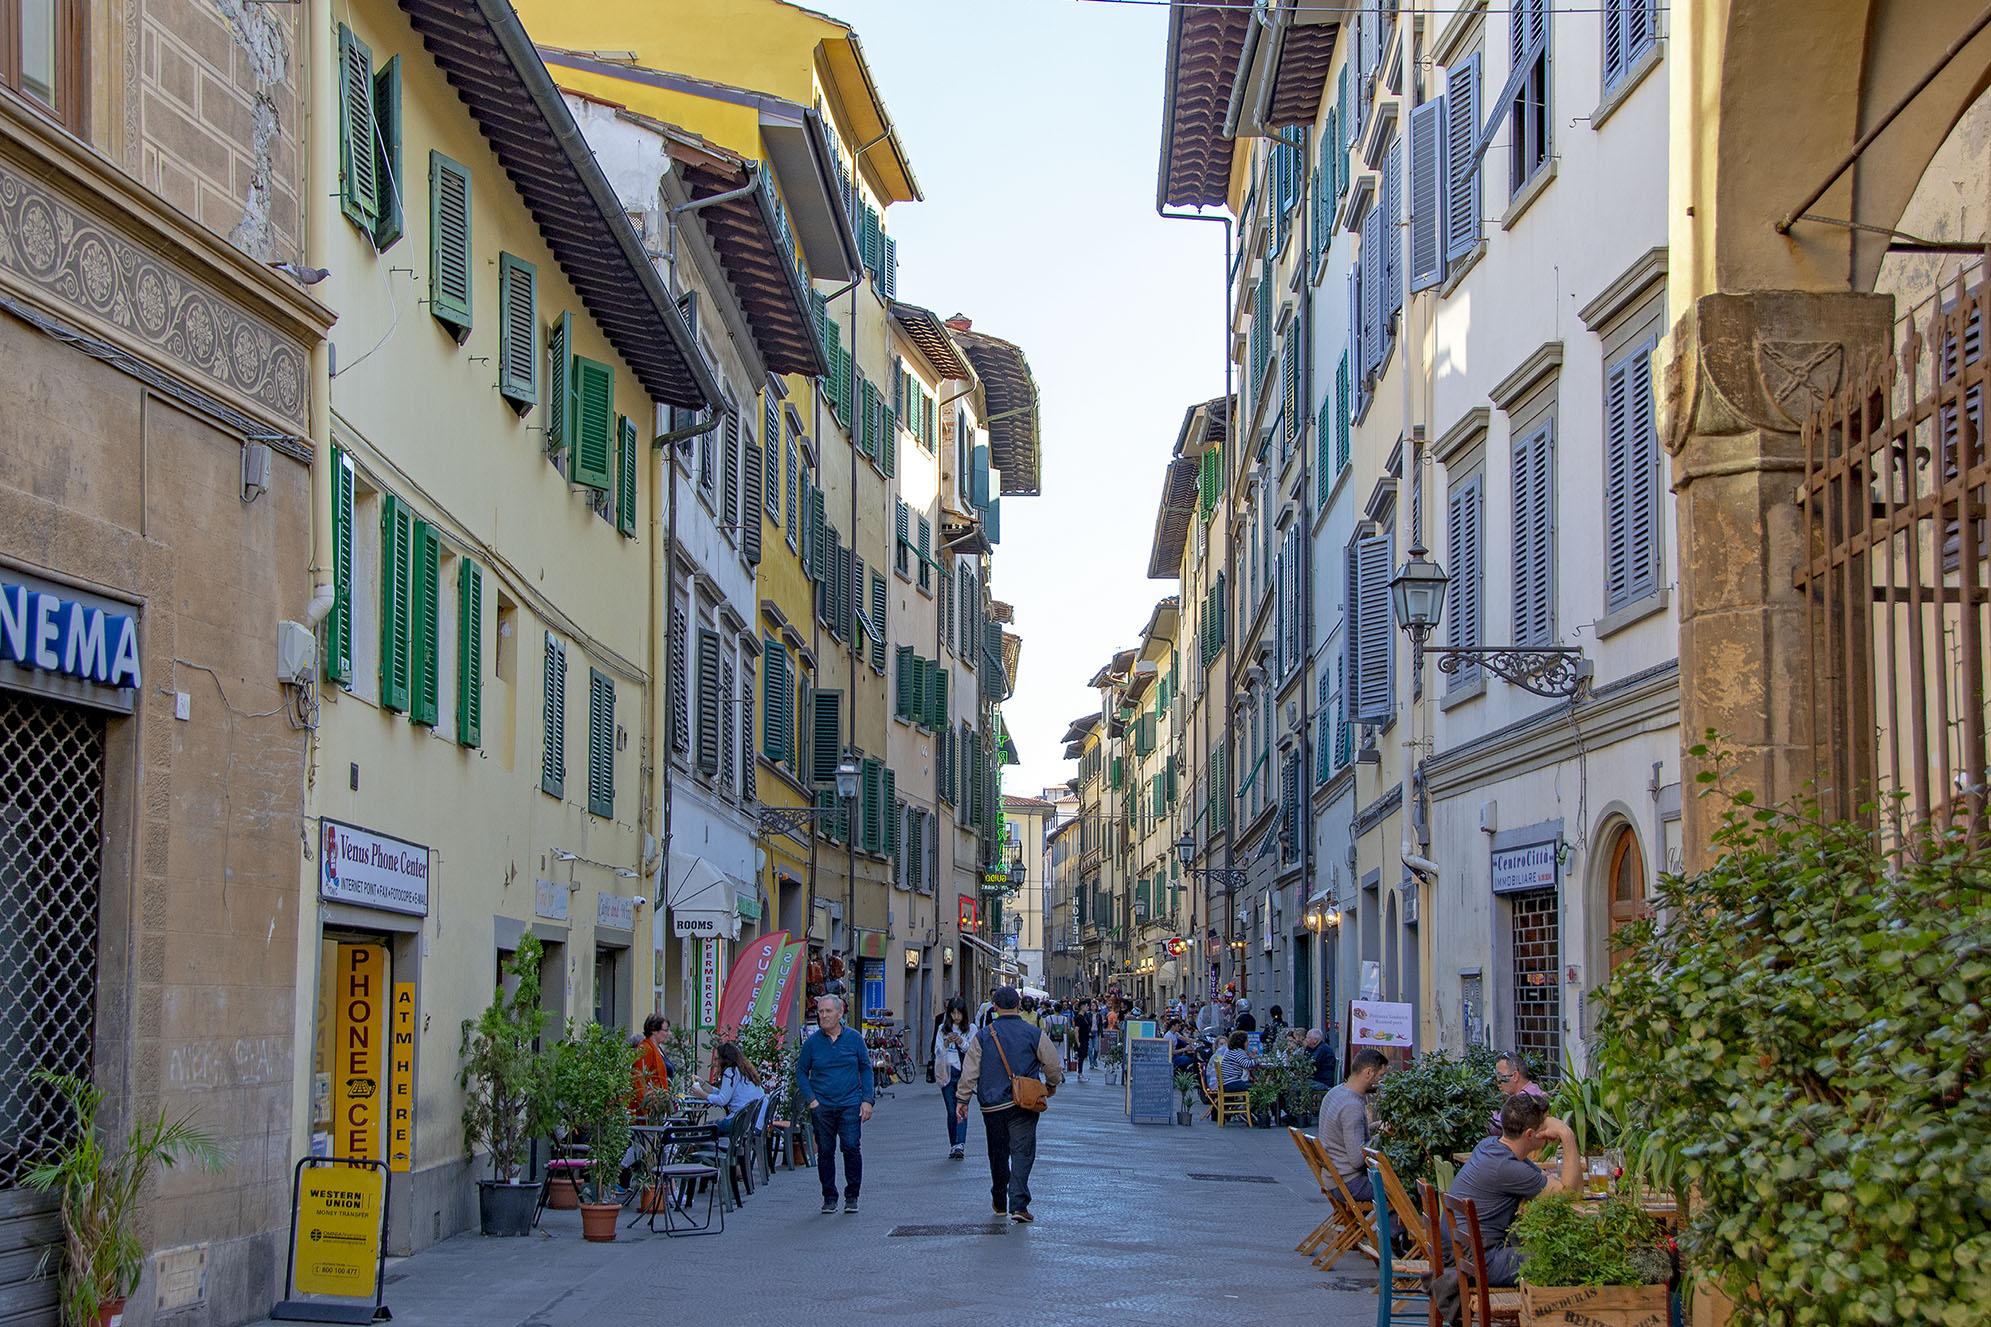 Via Faenza mitt emot The Market Urban Hotel.